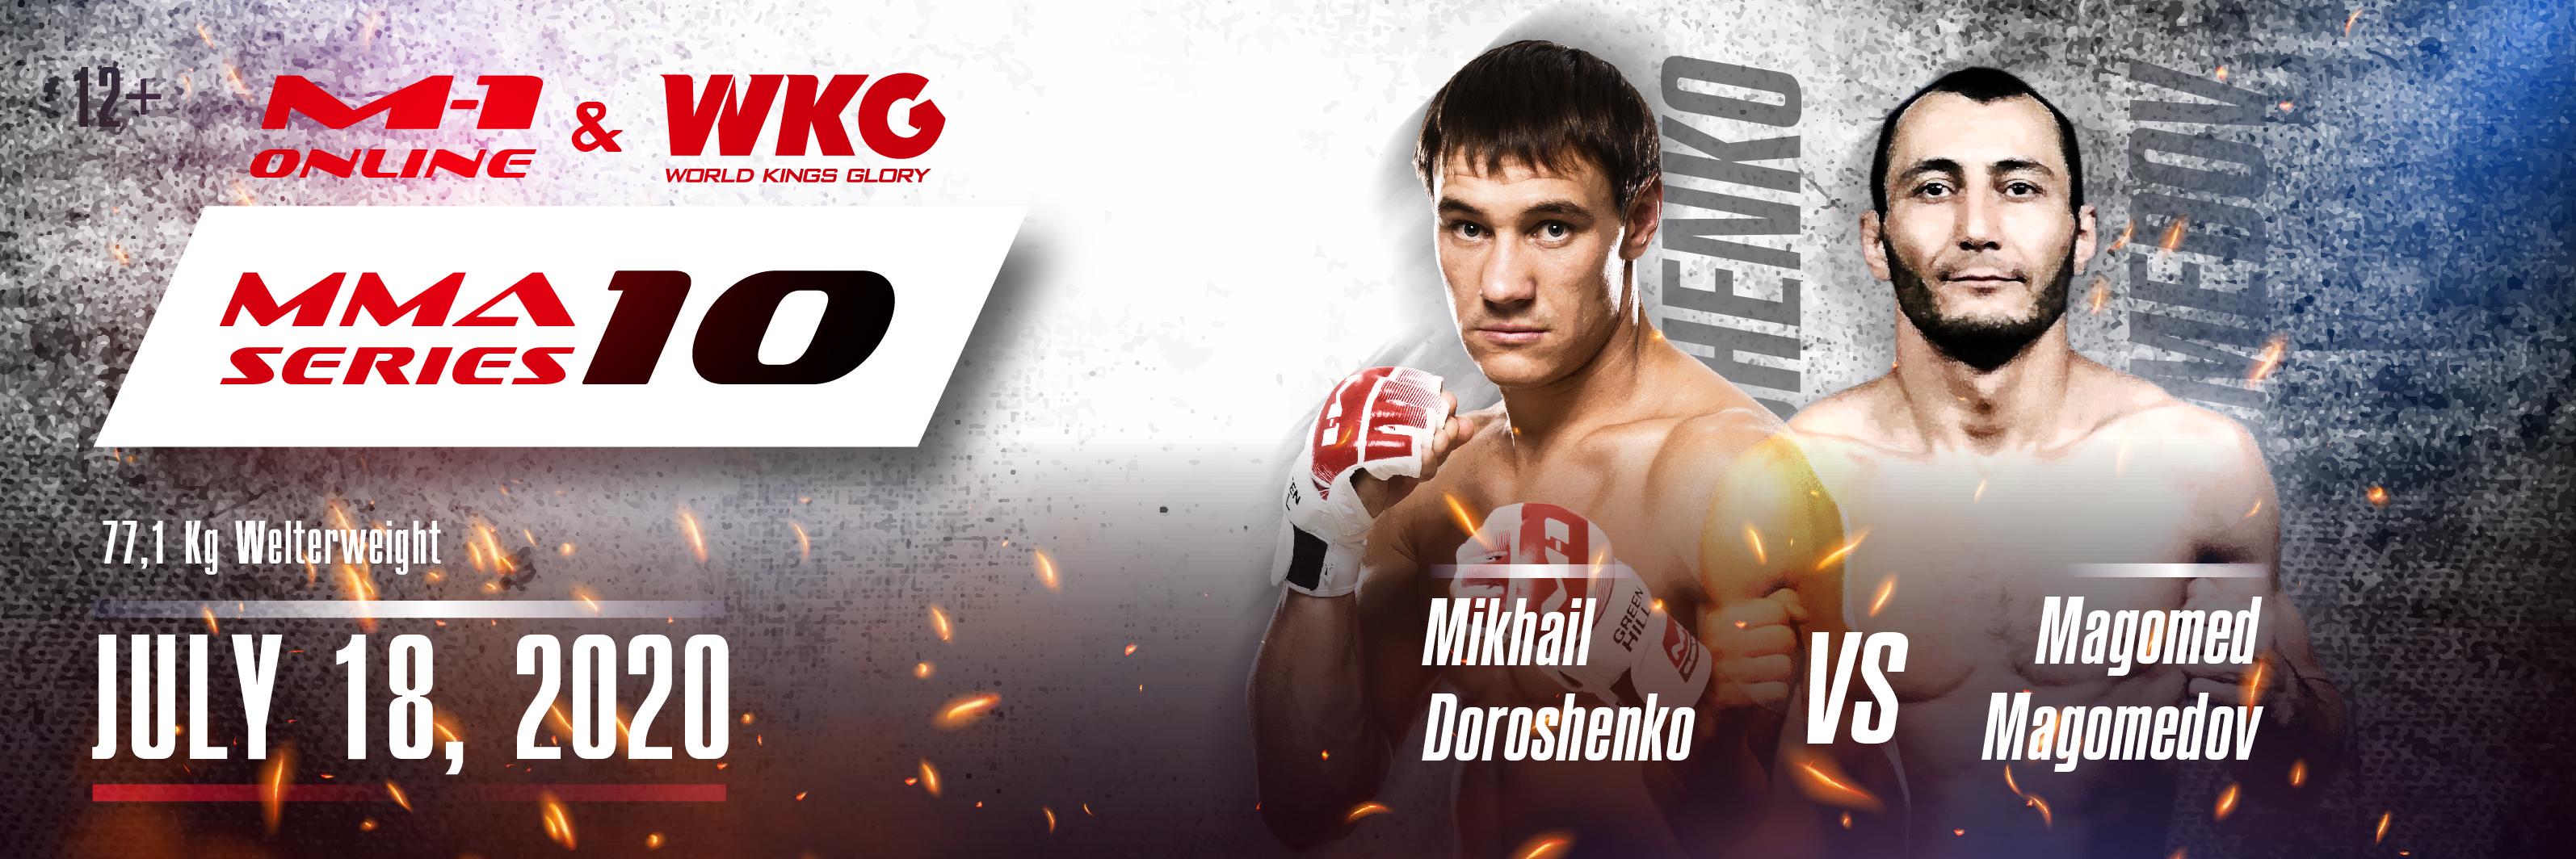 MMA Series 10